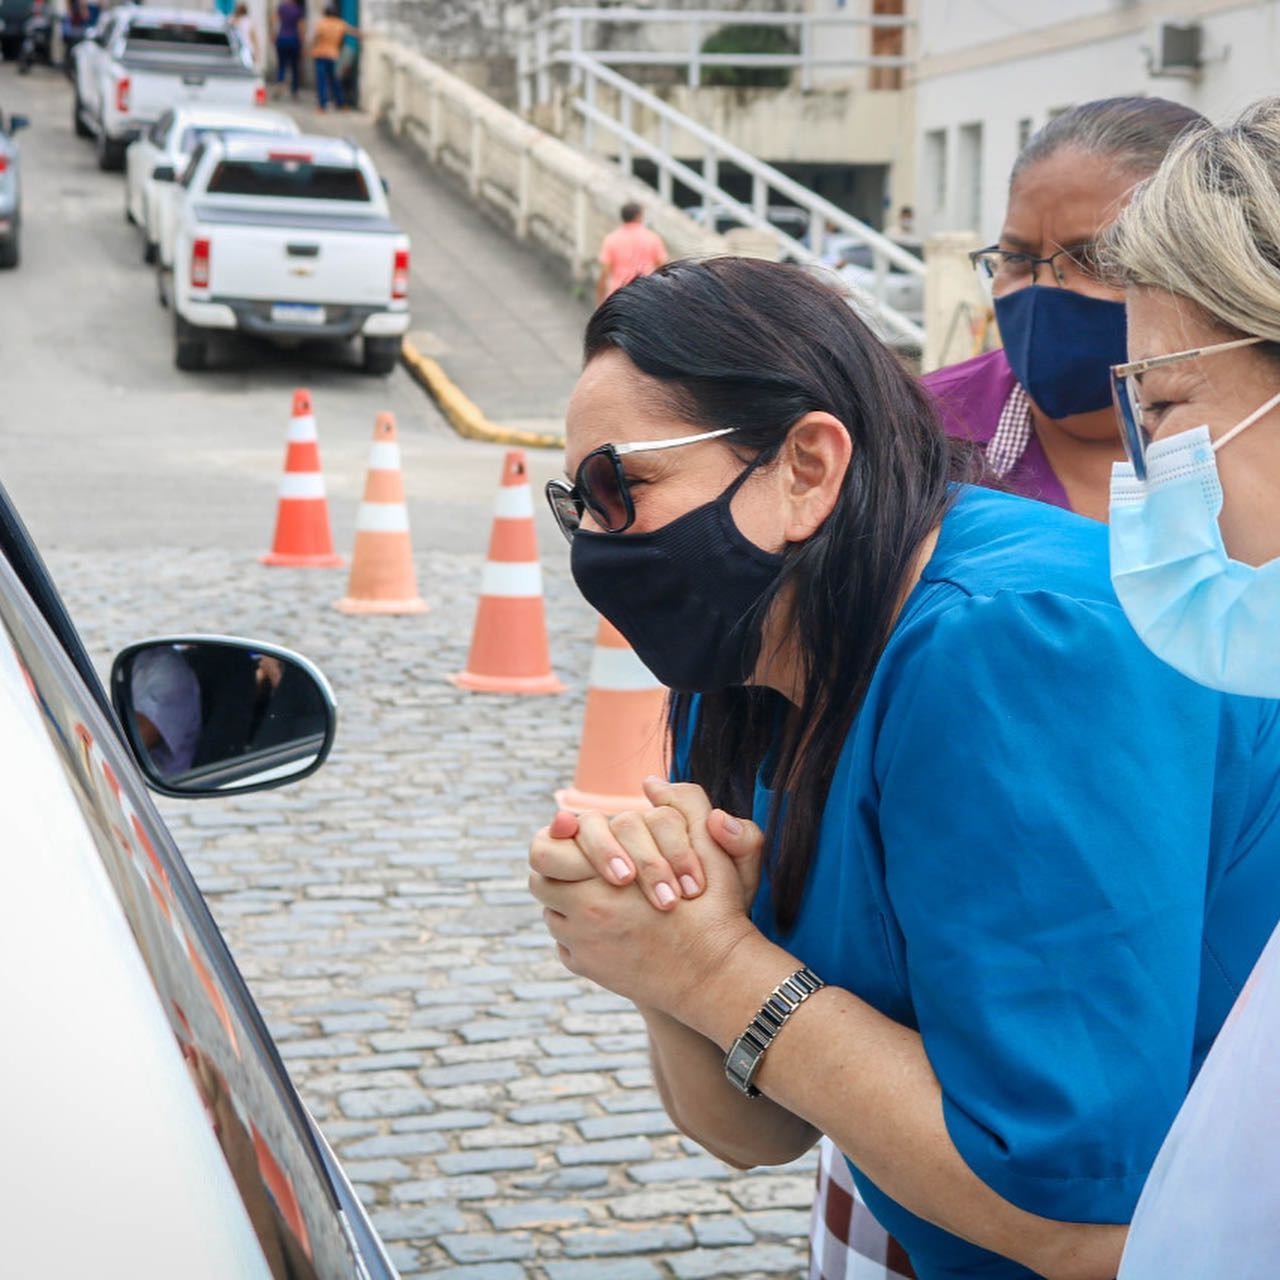 CATENDE VACINA IDOSOS NO SISTEMA DRIVE-THRU CONTRA COVID-19